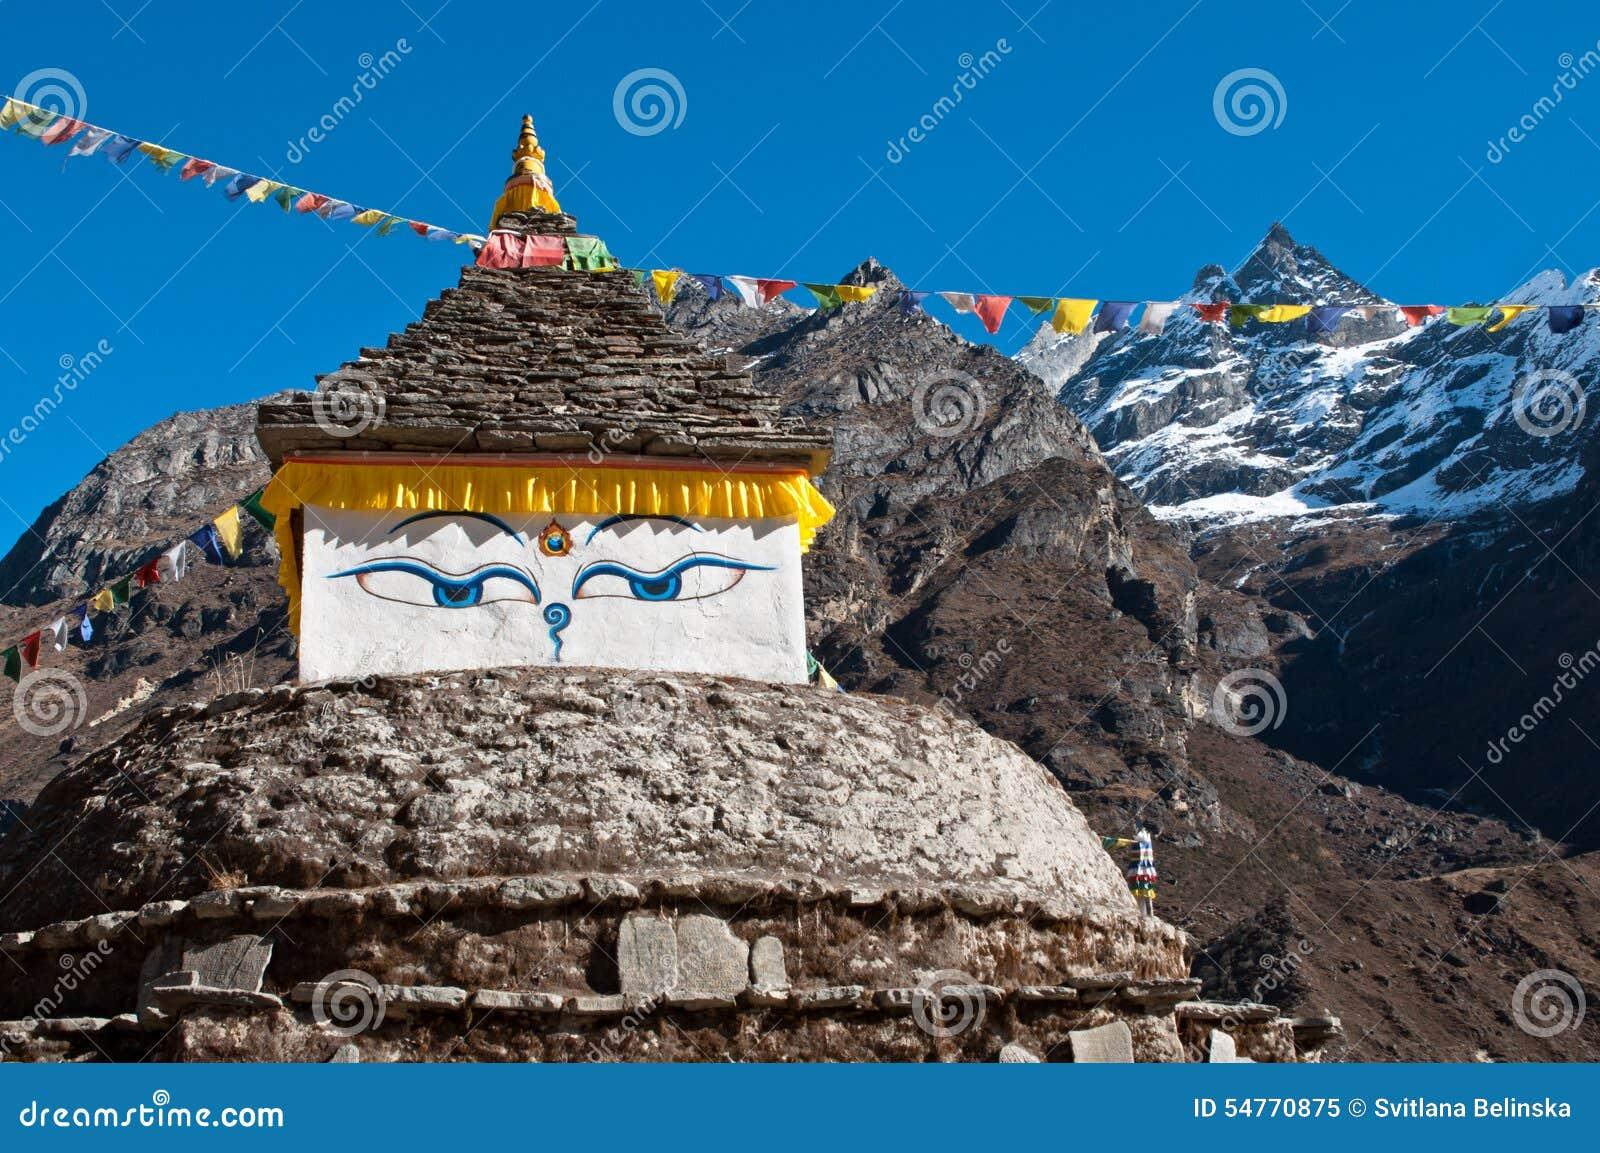 Buddha eyes in Himalayas